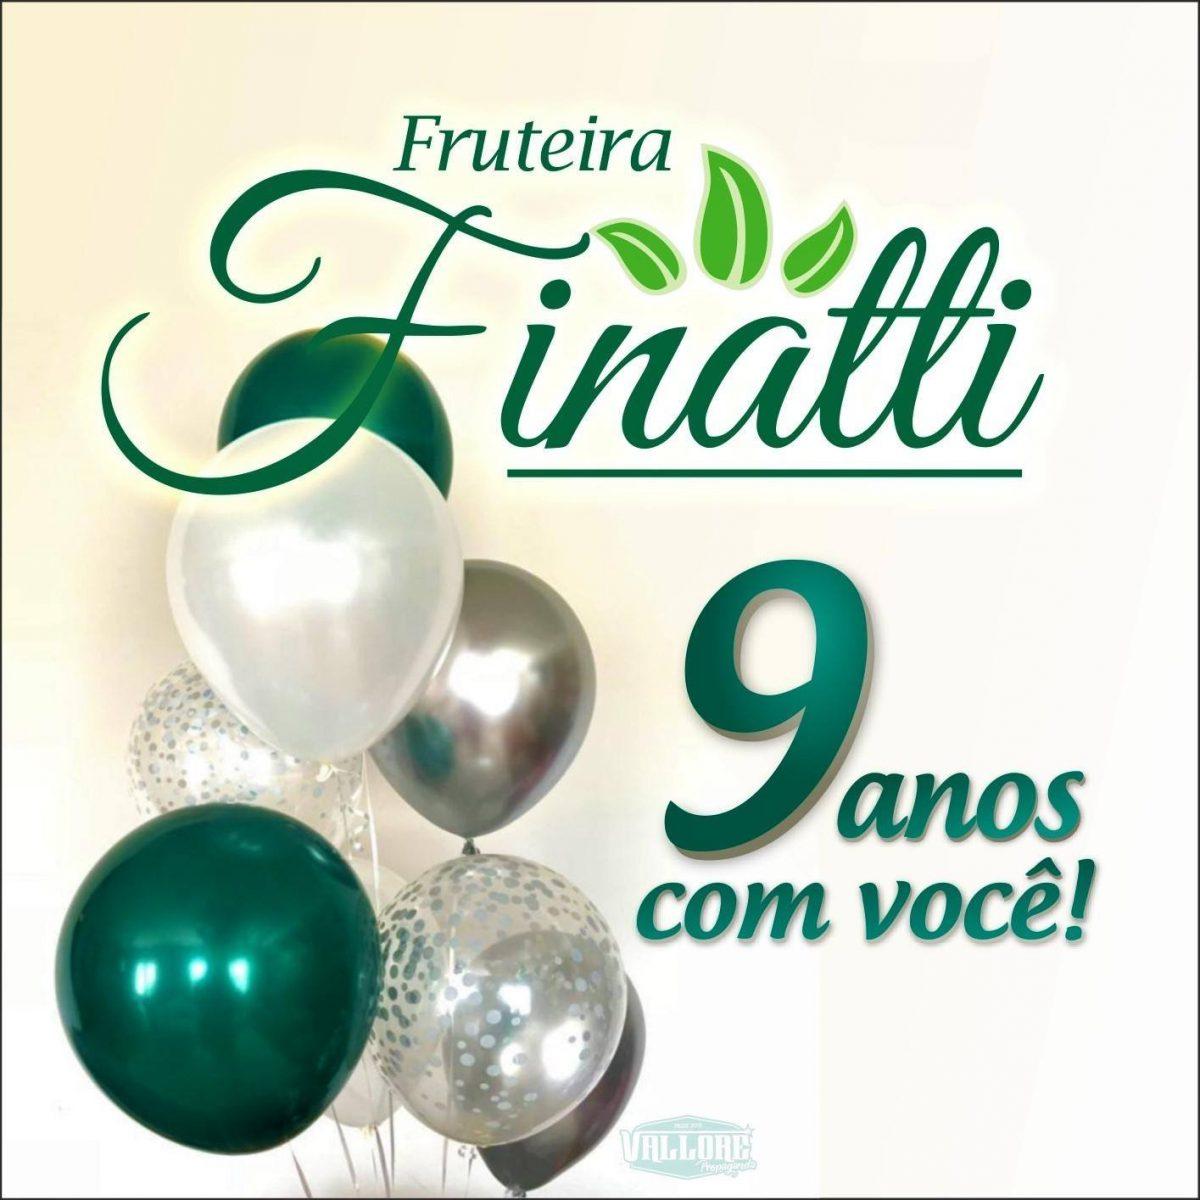 Fruteira Finatti